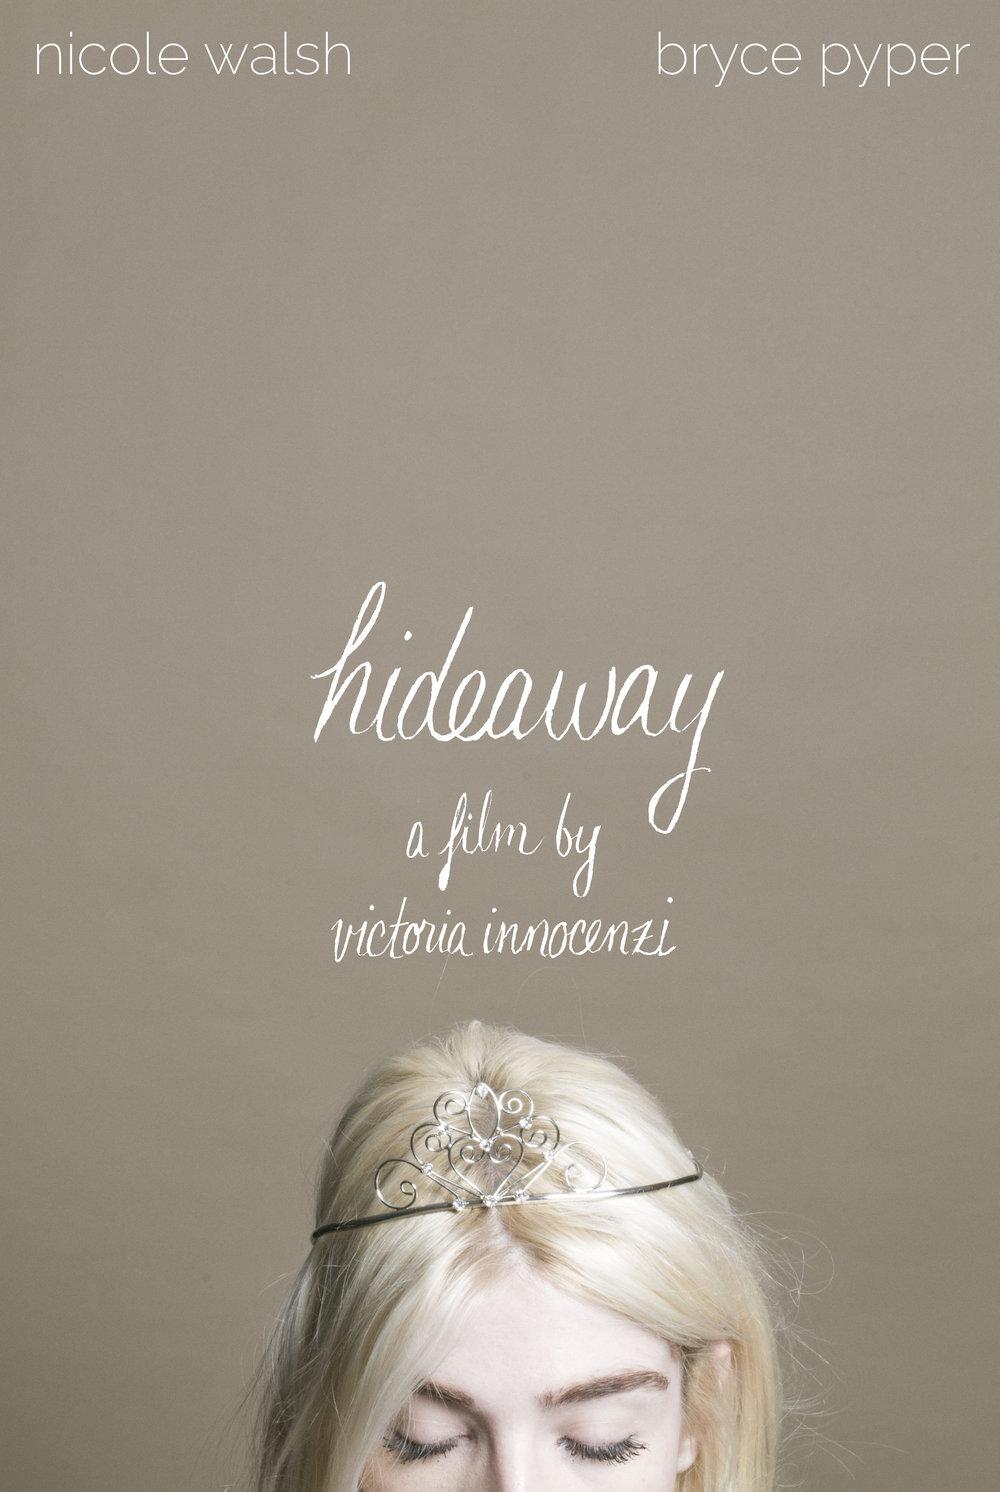 hideawayposter.jpg